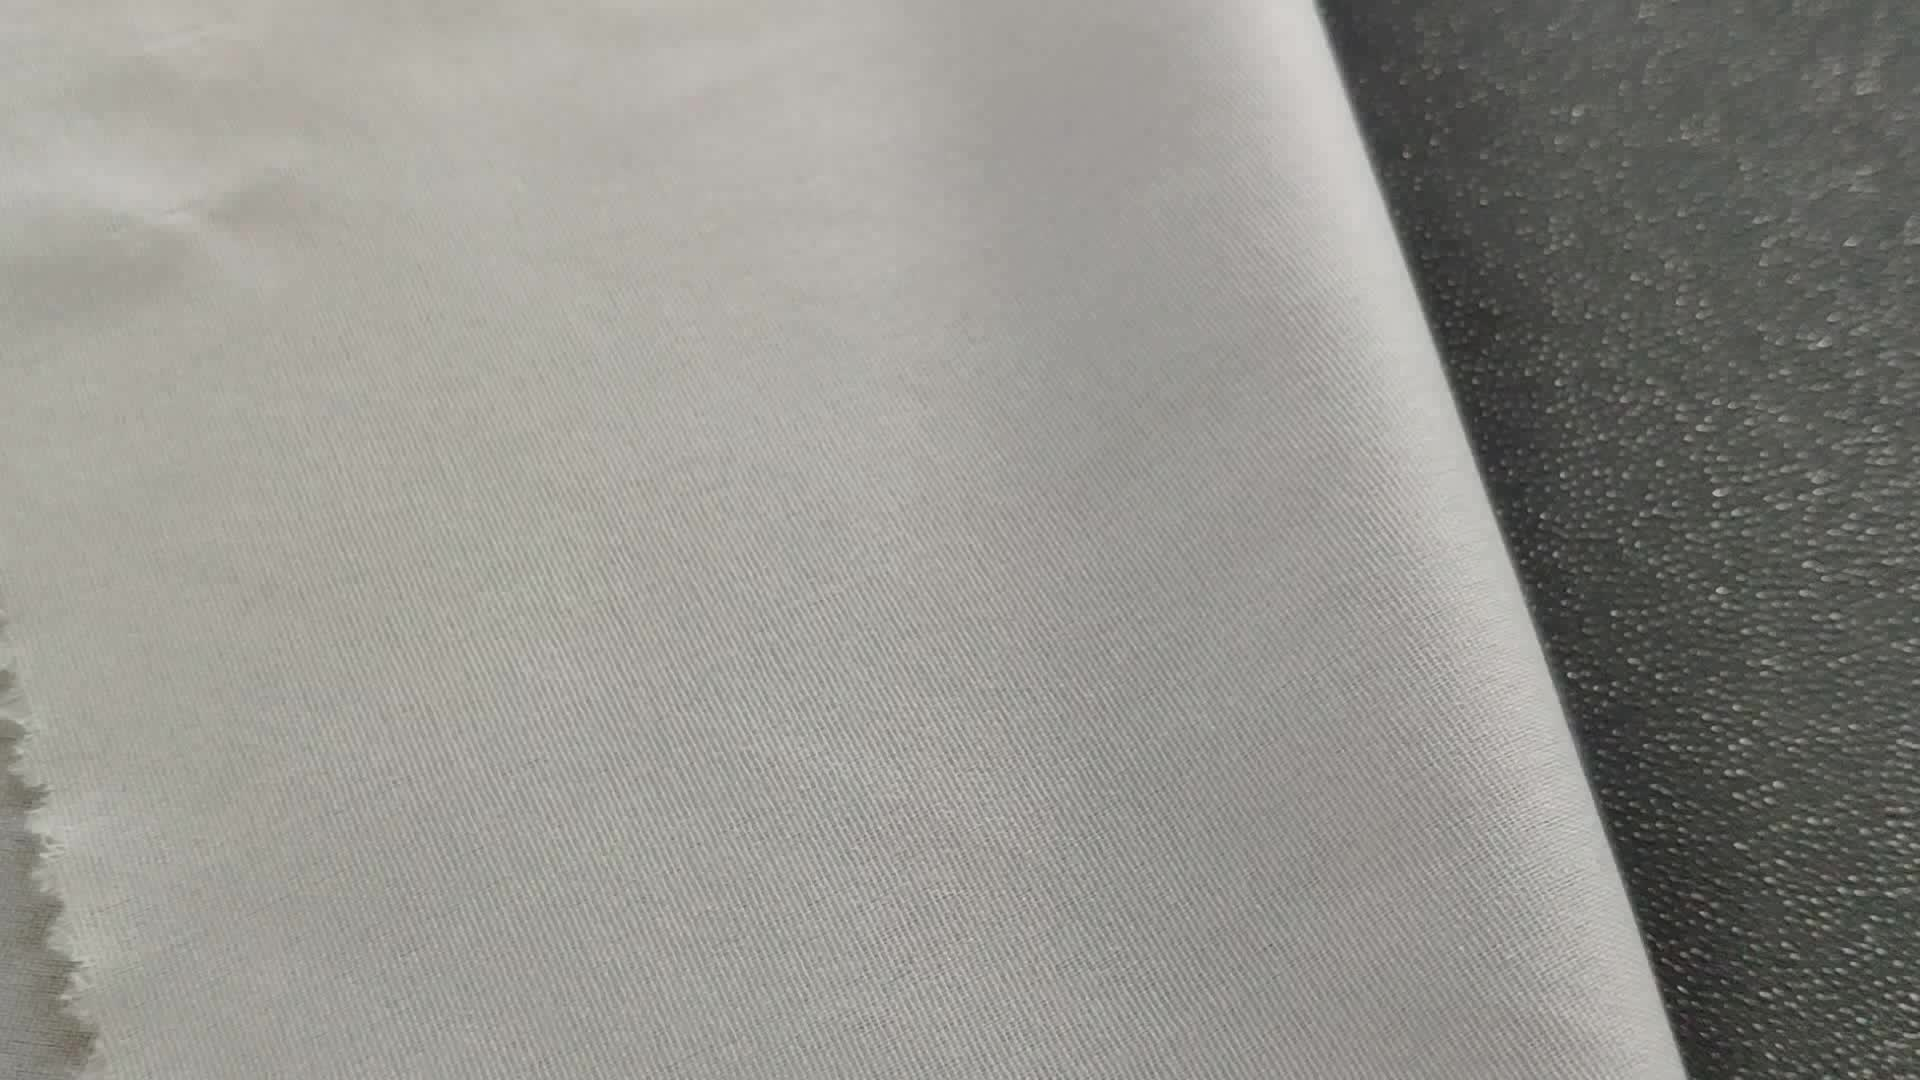 Al por mayor personalizado fusible Doble Punto de tejido liso tejido abrigo entretela